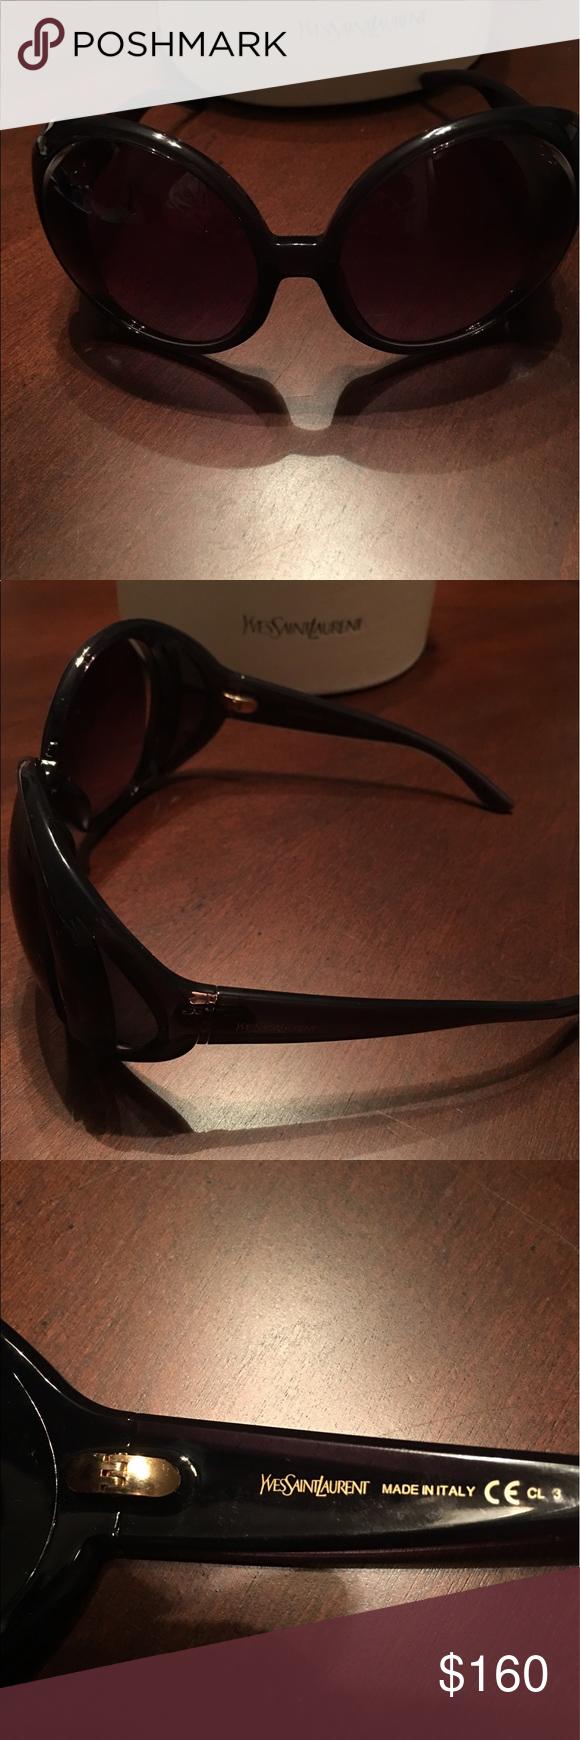 56b57d48740 Yves Saint Laurent Egypt Circular Sunglasses Yves Saint Laurent Oversized Circular  Sunglasses